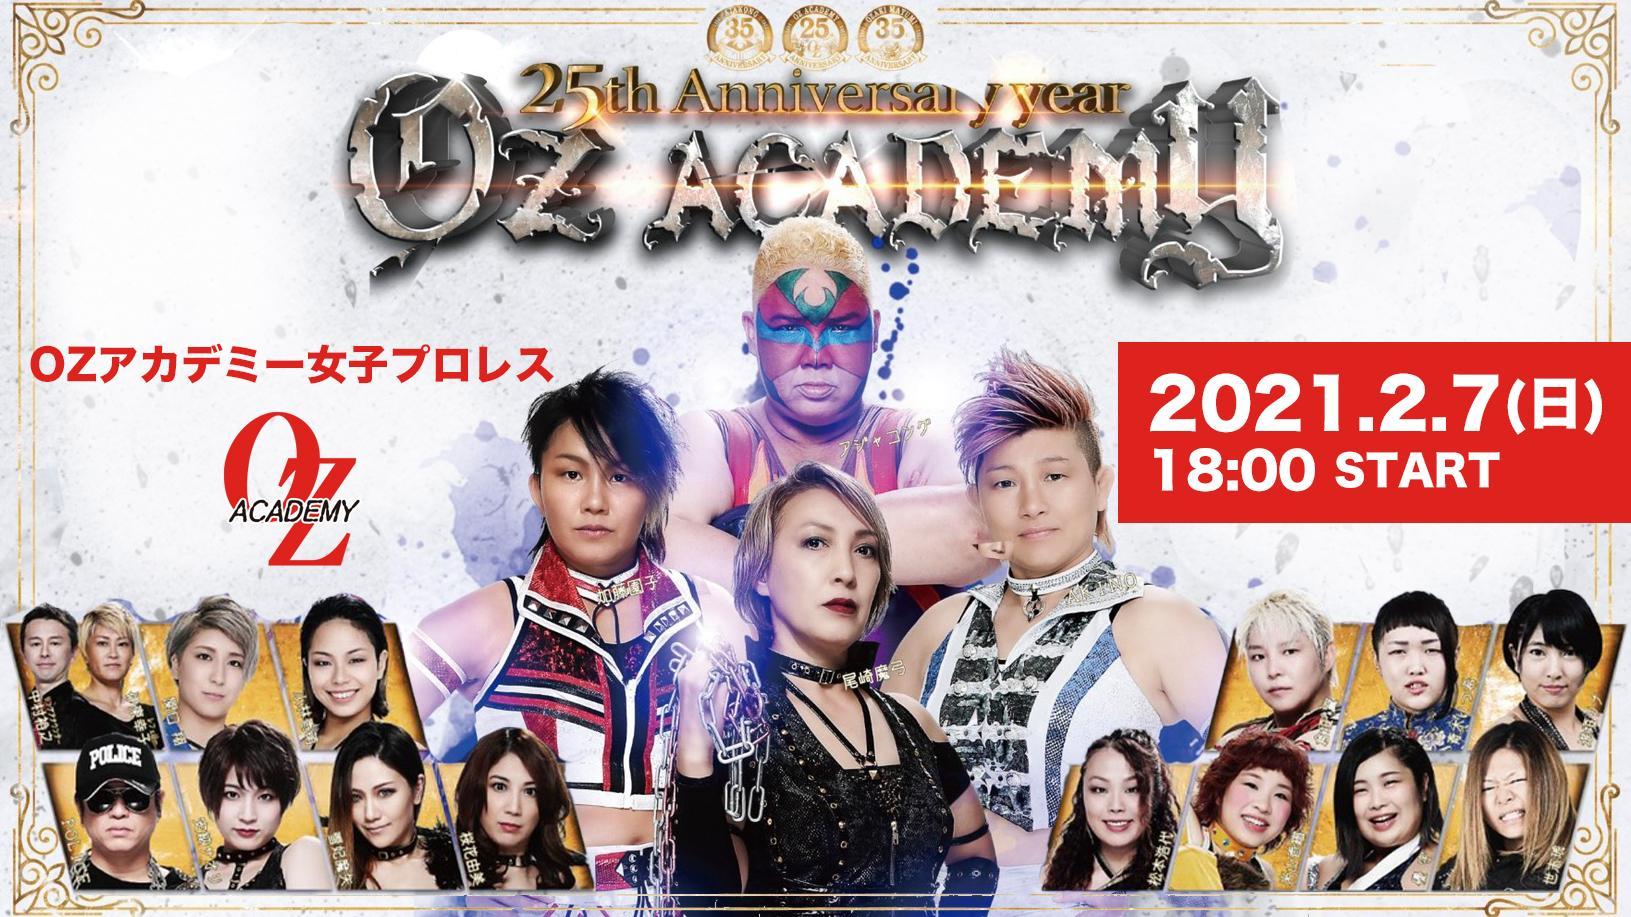 OZアカデミー女子プロレス2021.2.7新宿フェイス大会の写真2